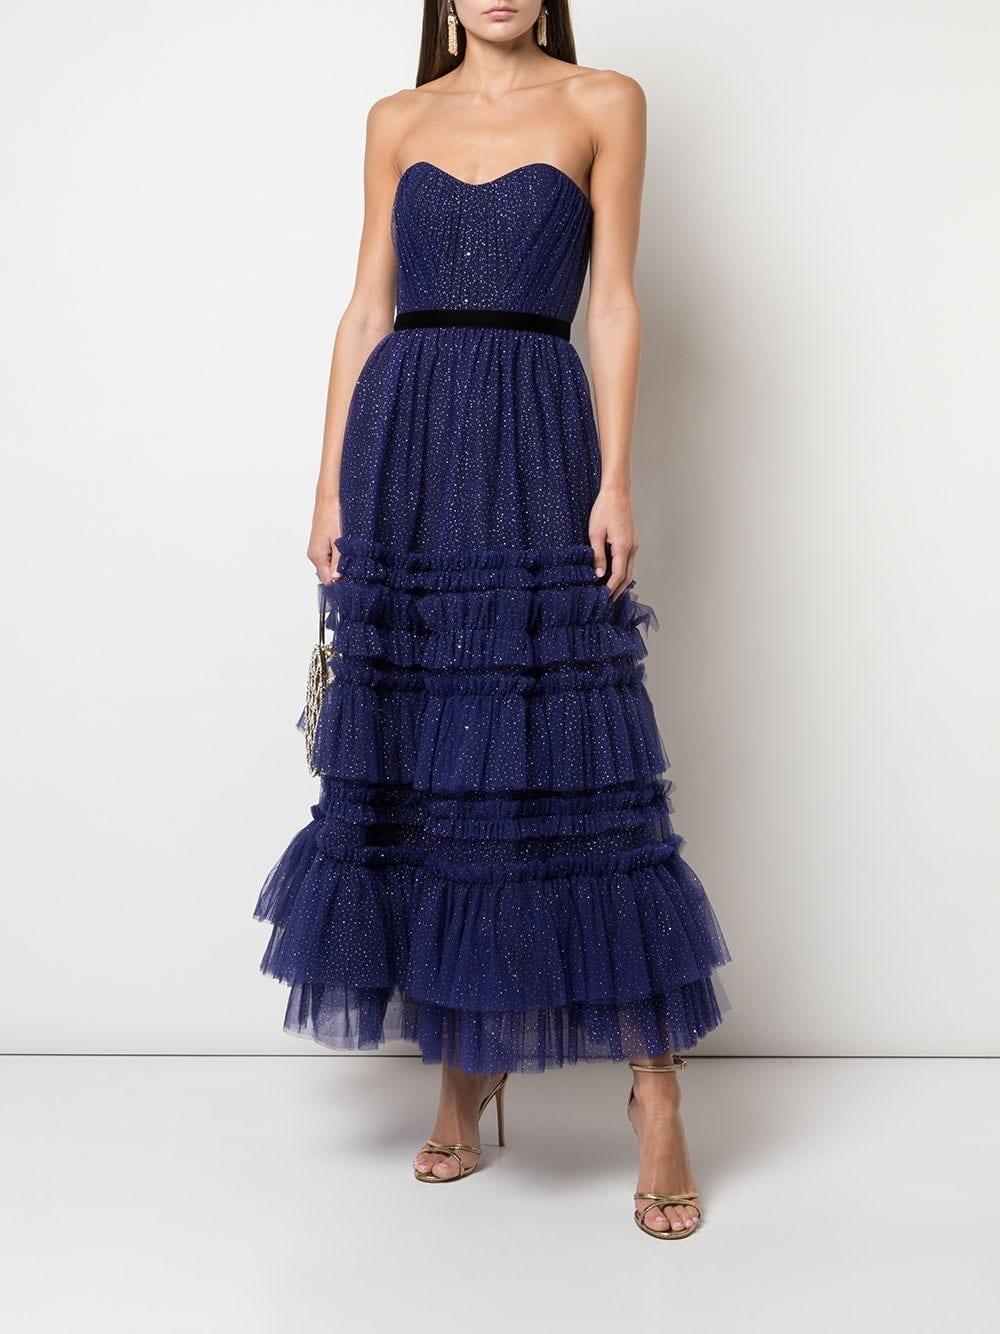 MARCHESA NOTTE Glitter Ruffle Gown